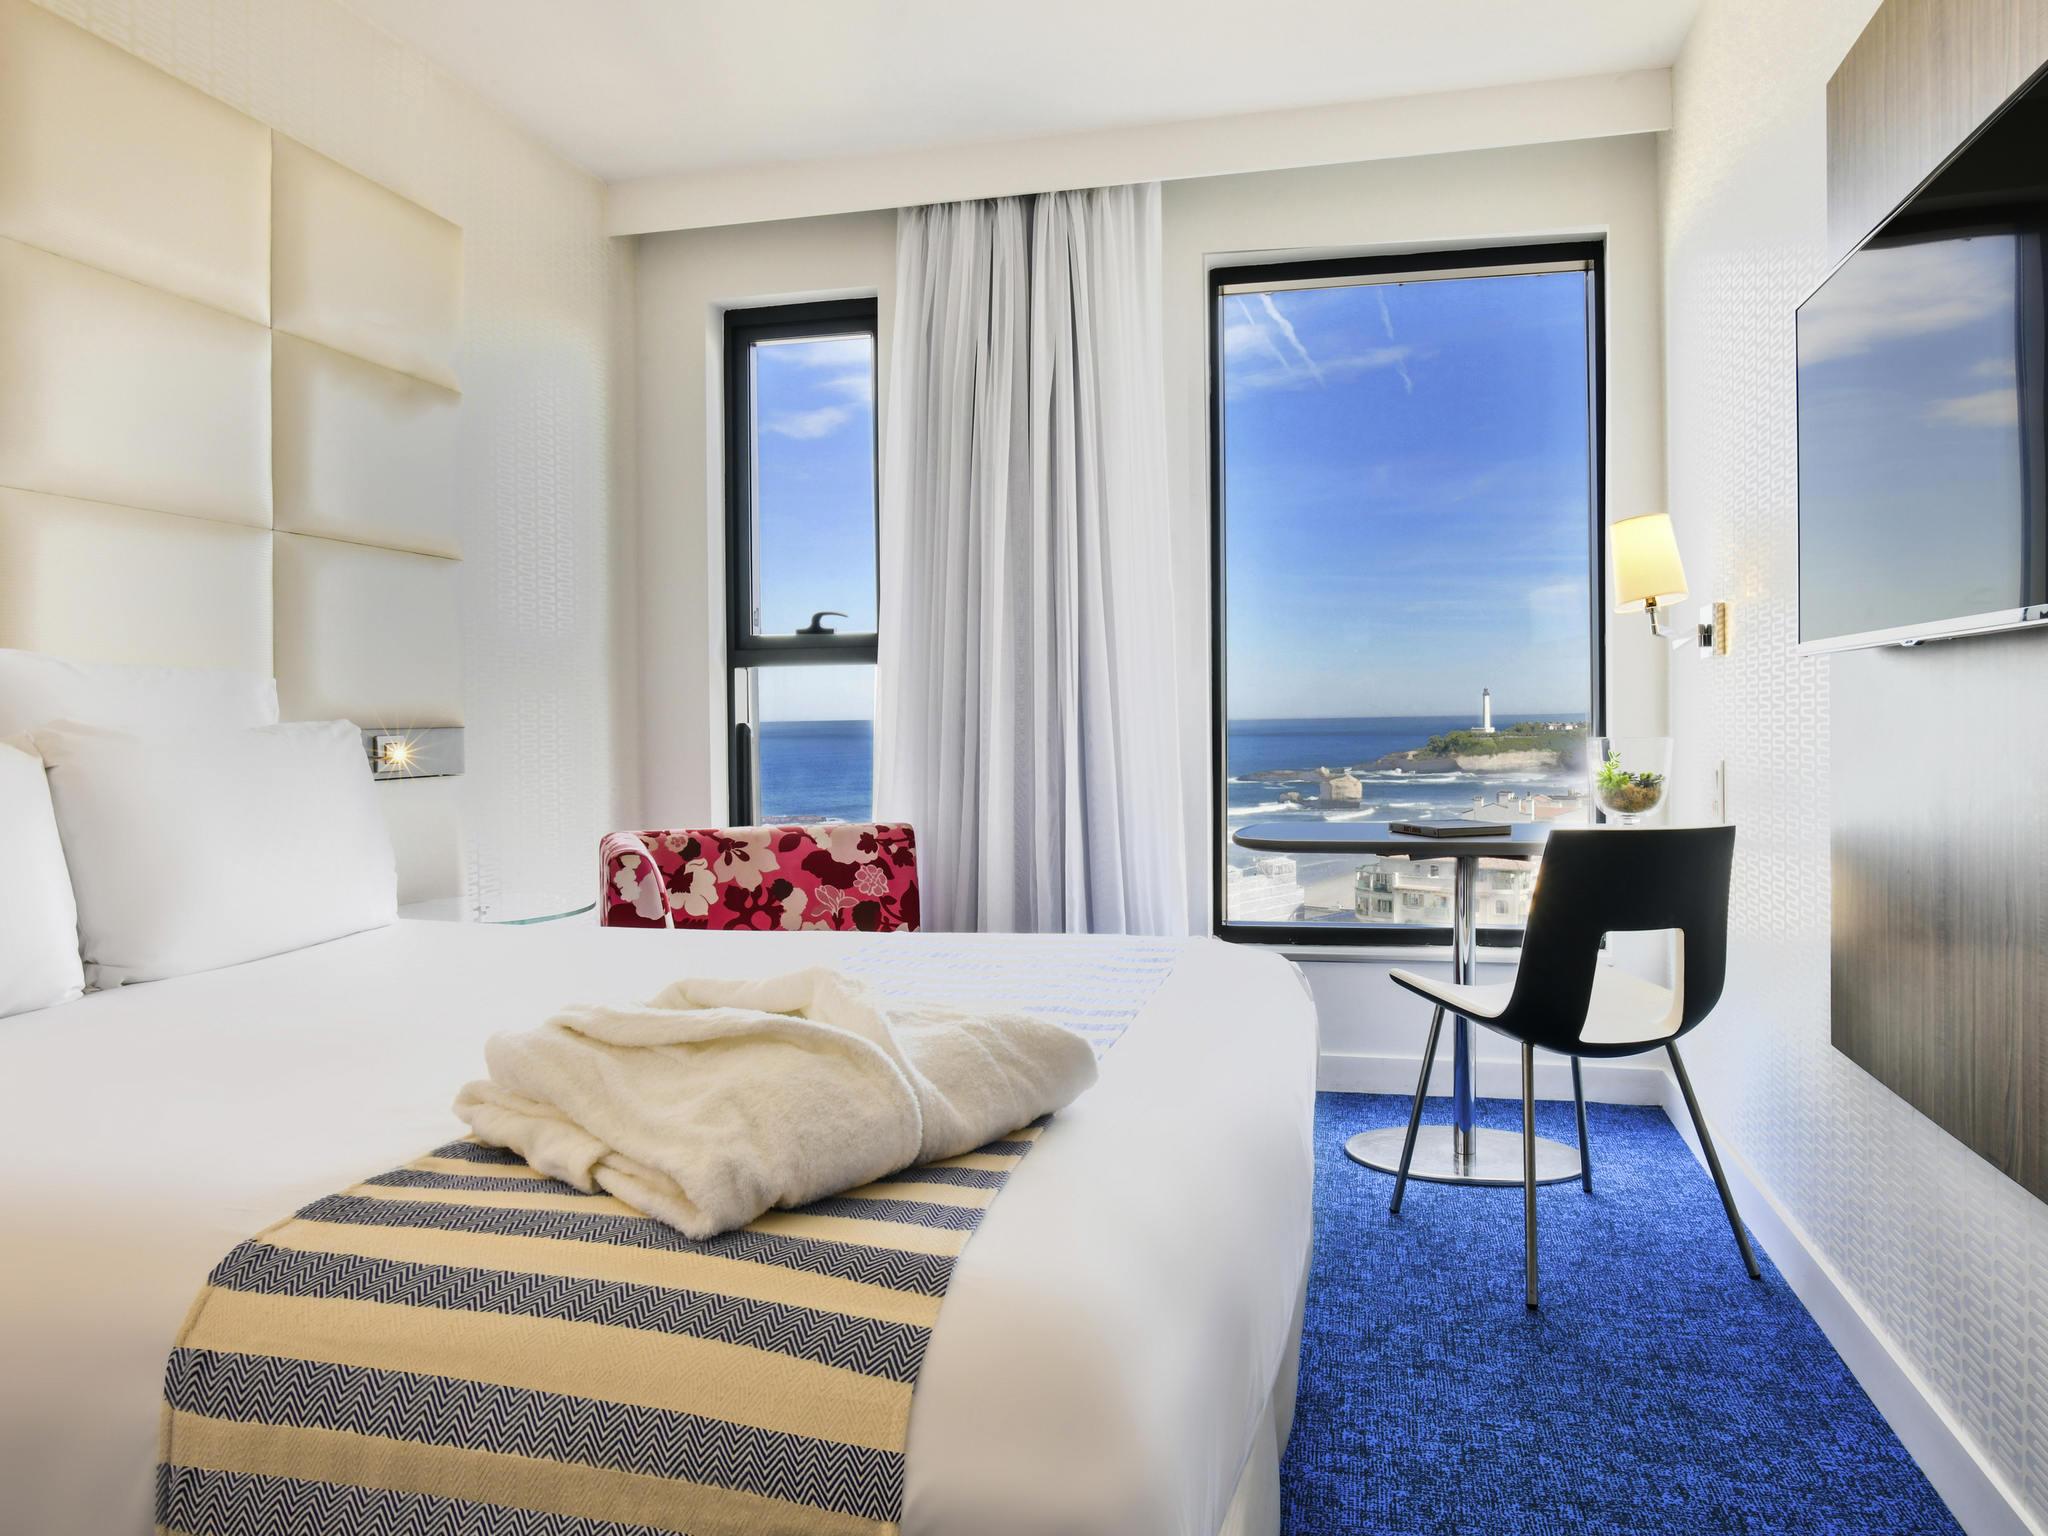 Hotel – Albergo Mercure Le President Biarritz Centre